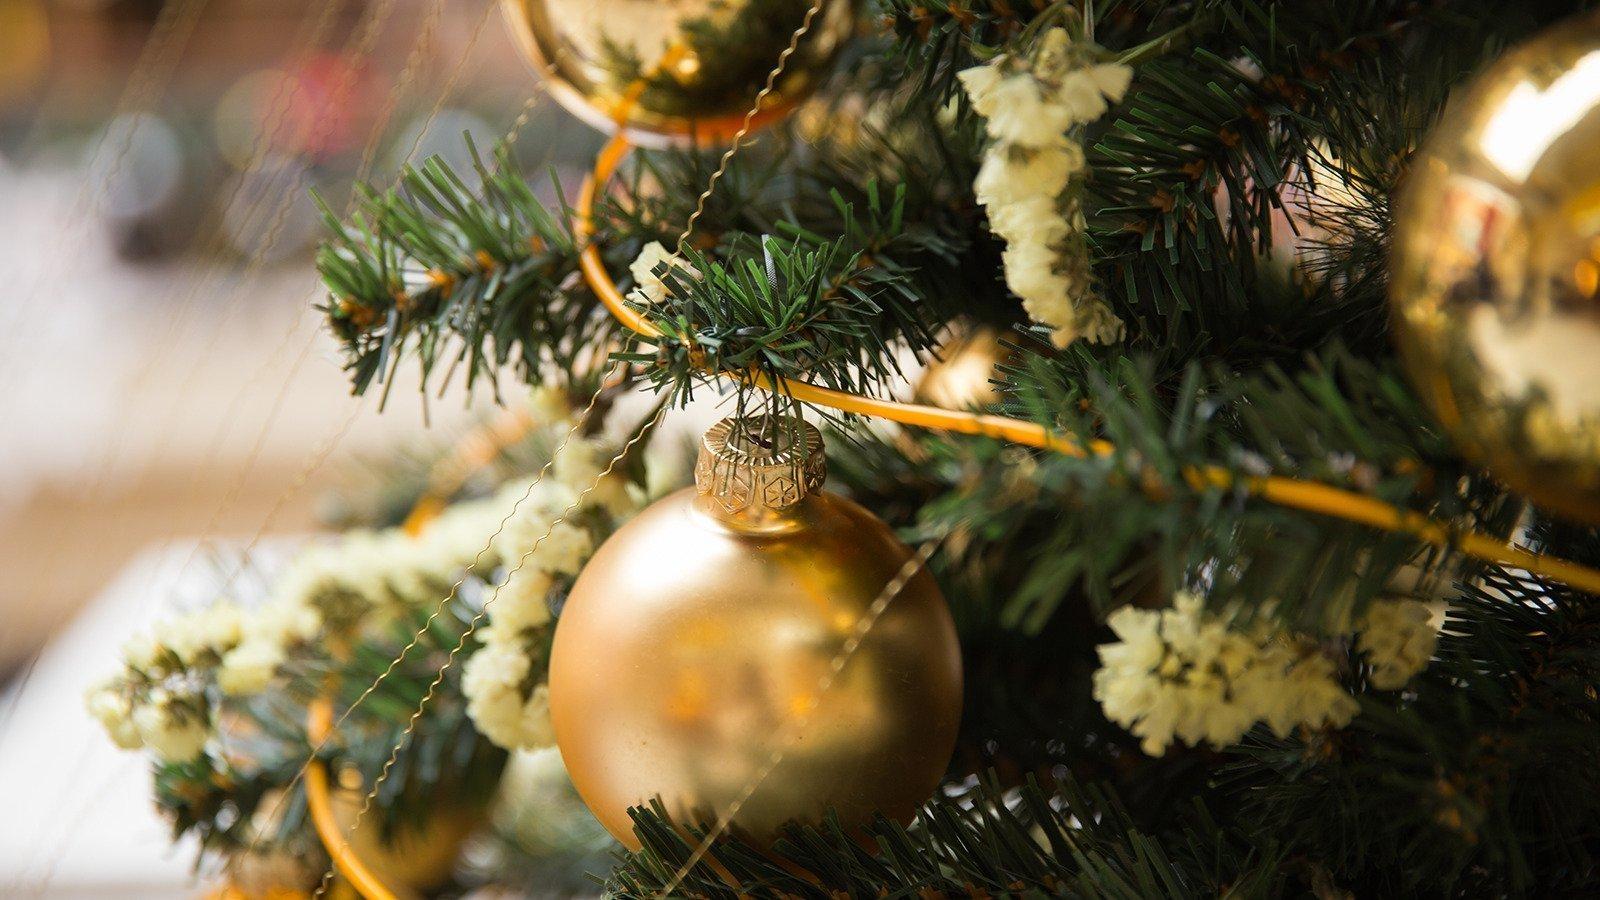 Pynt tidligt op til jul og bliv lykkelig